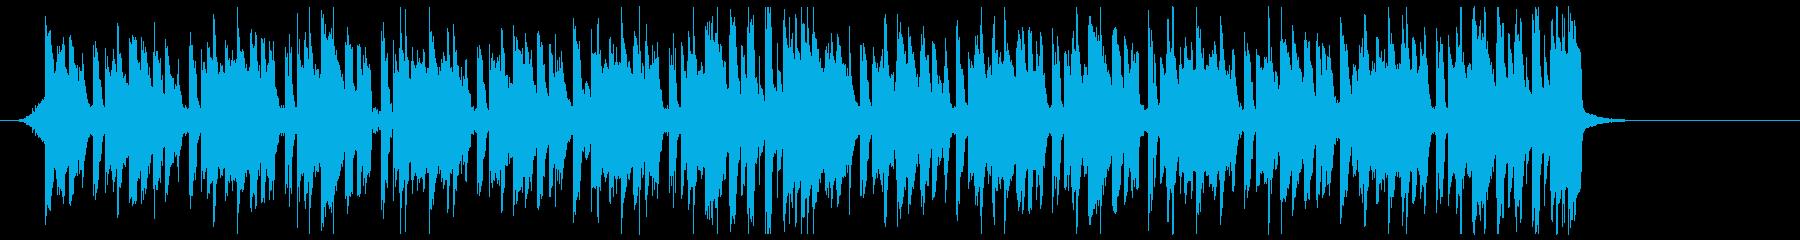 K-POP、EDM、ディスコ cの再生済みの波形